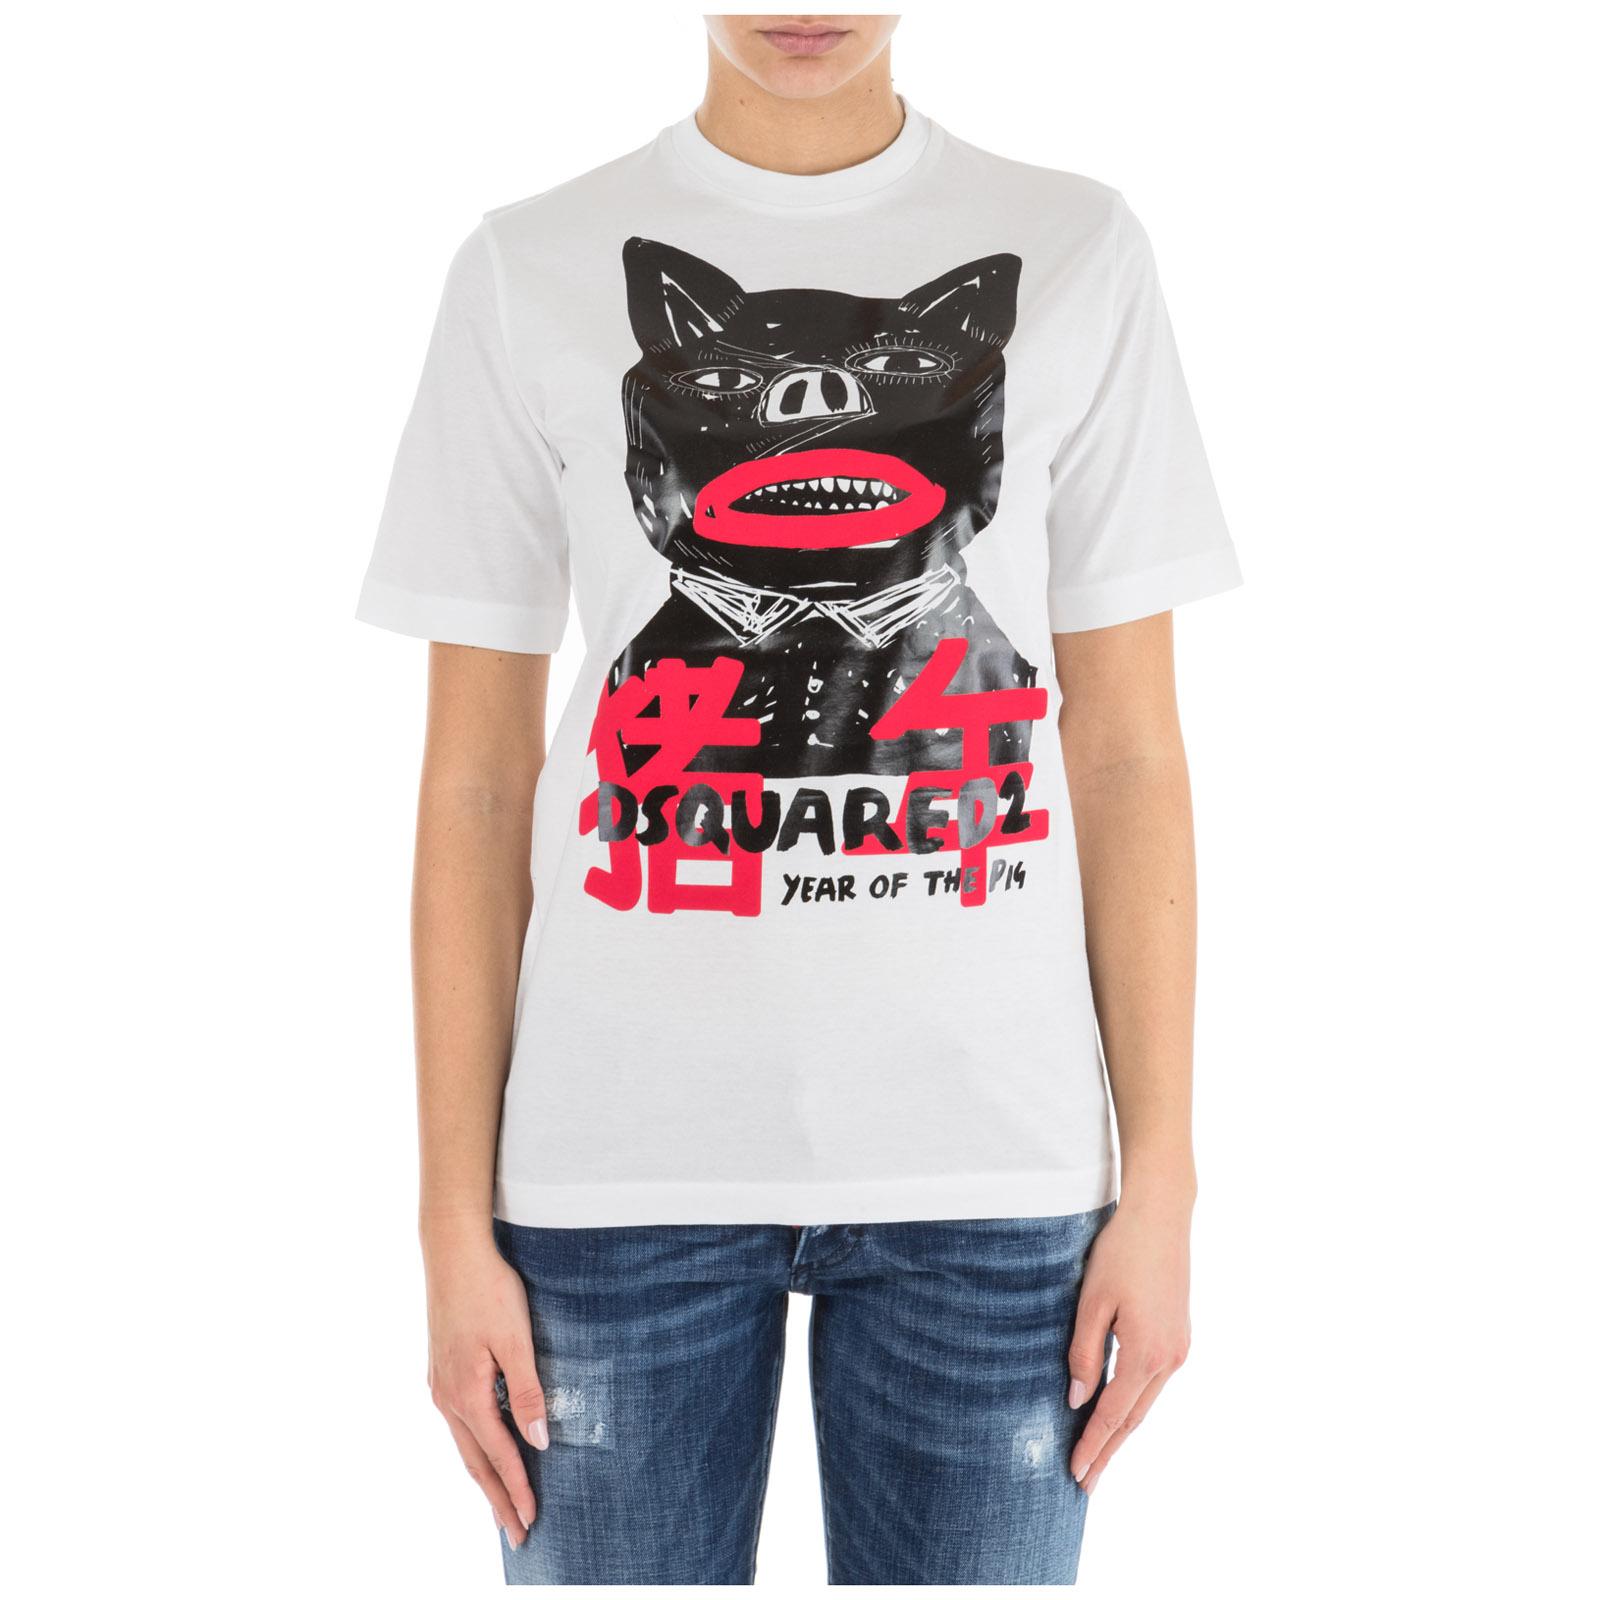 Women's t-shirt short sleeve crew neck round pig punk